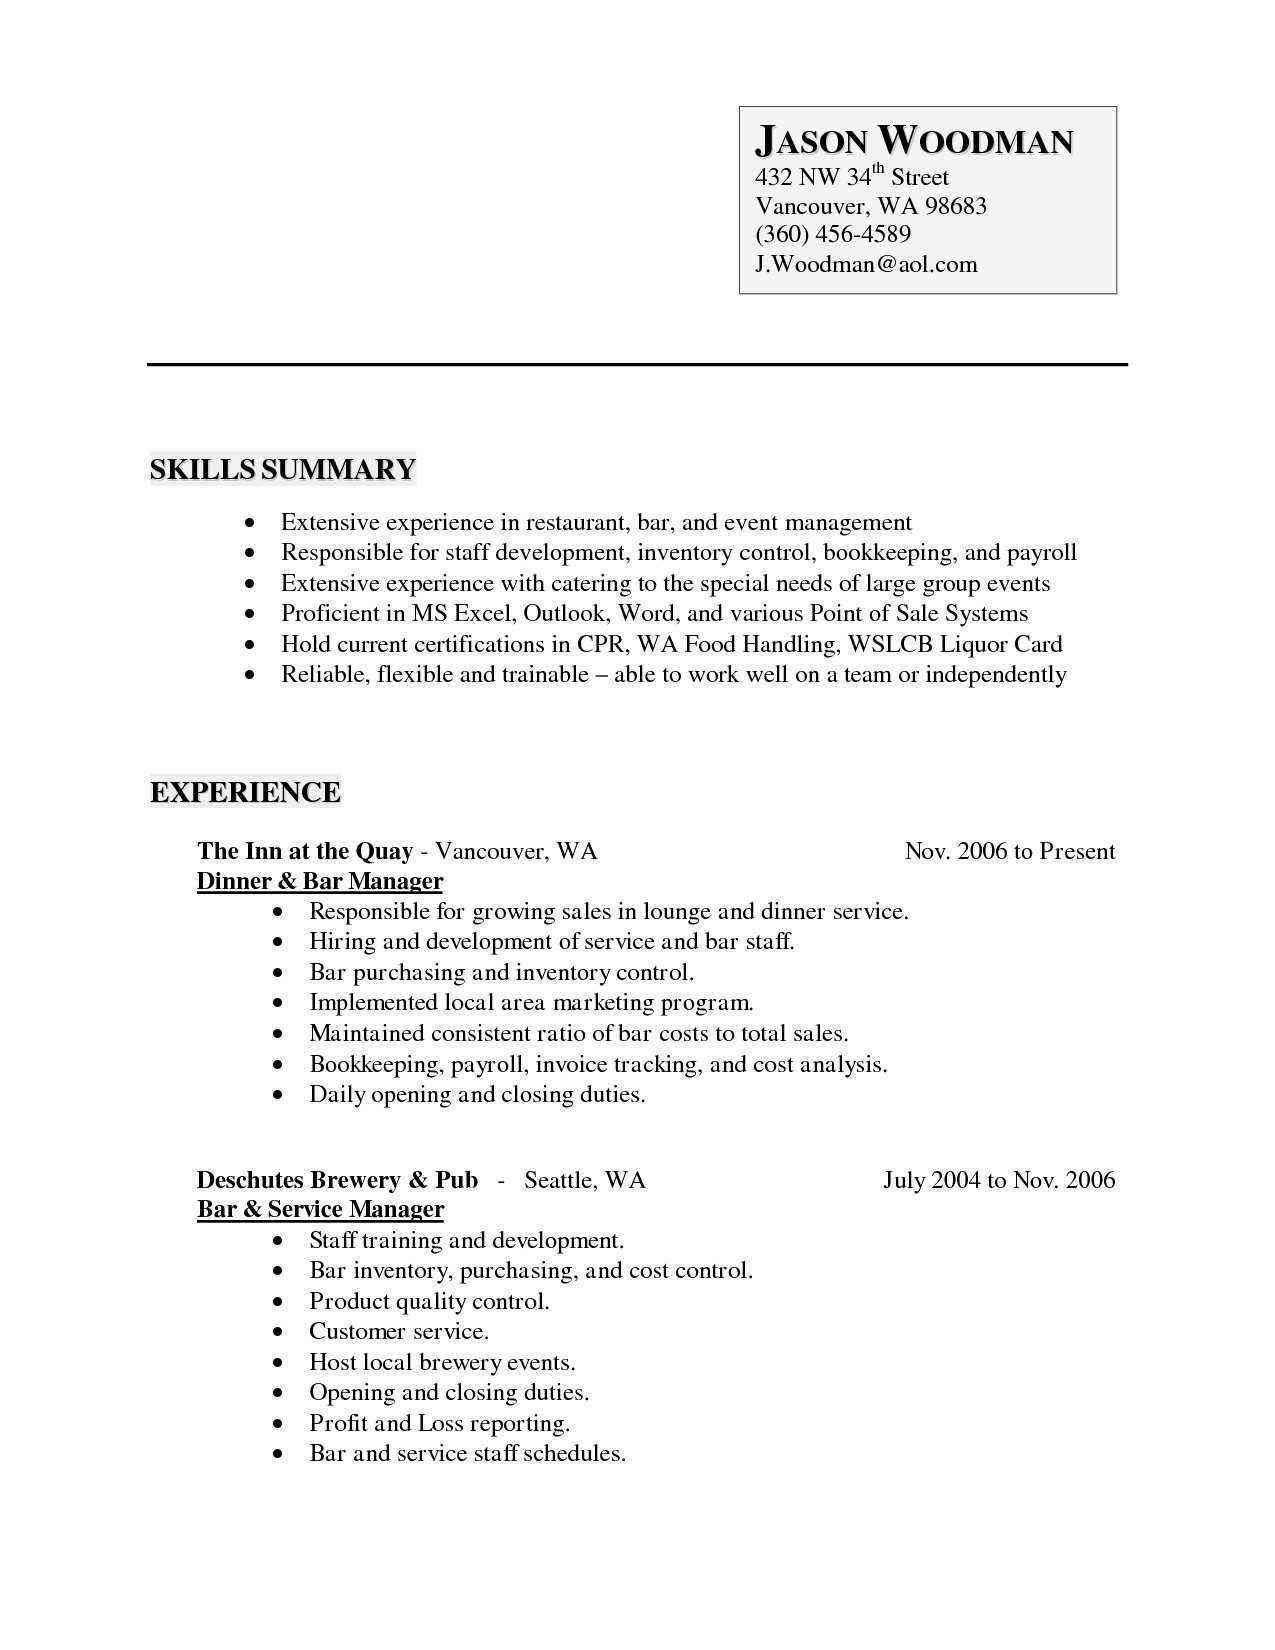 Expert resume writing 9th graders